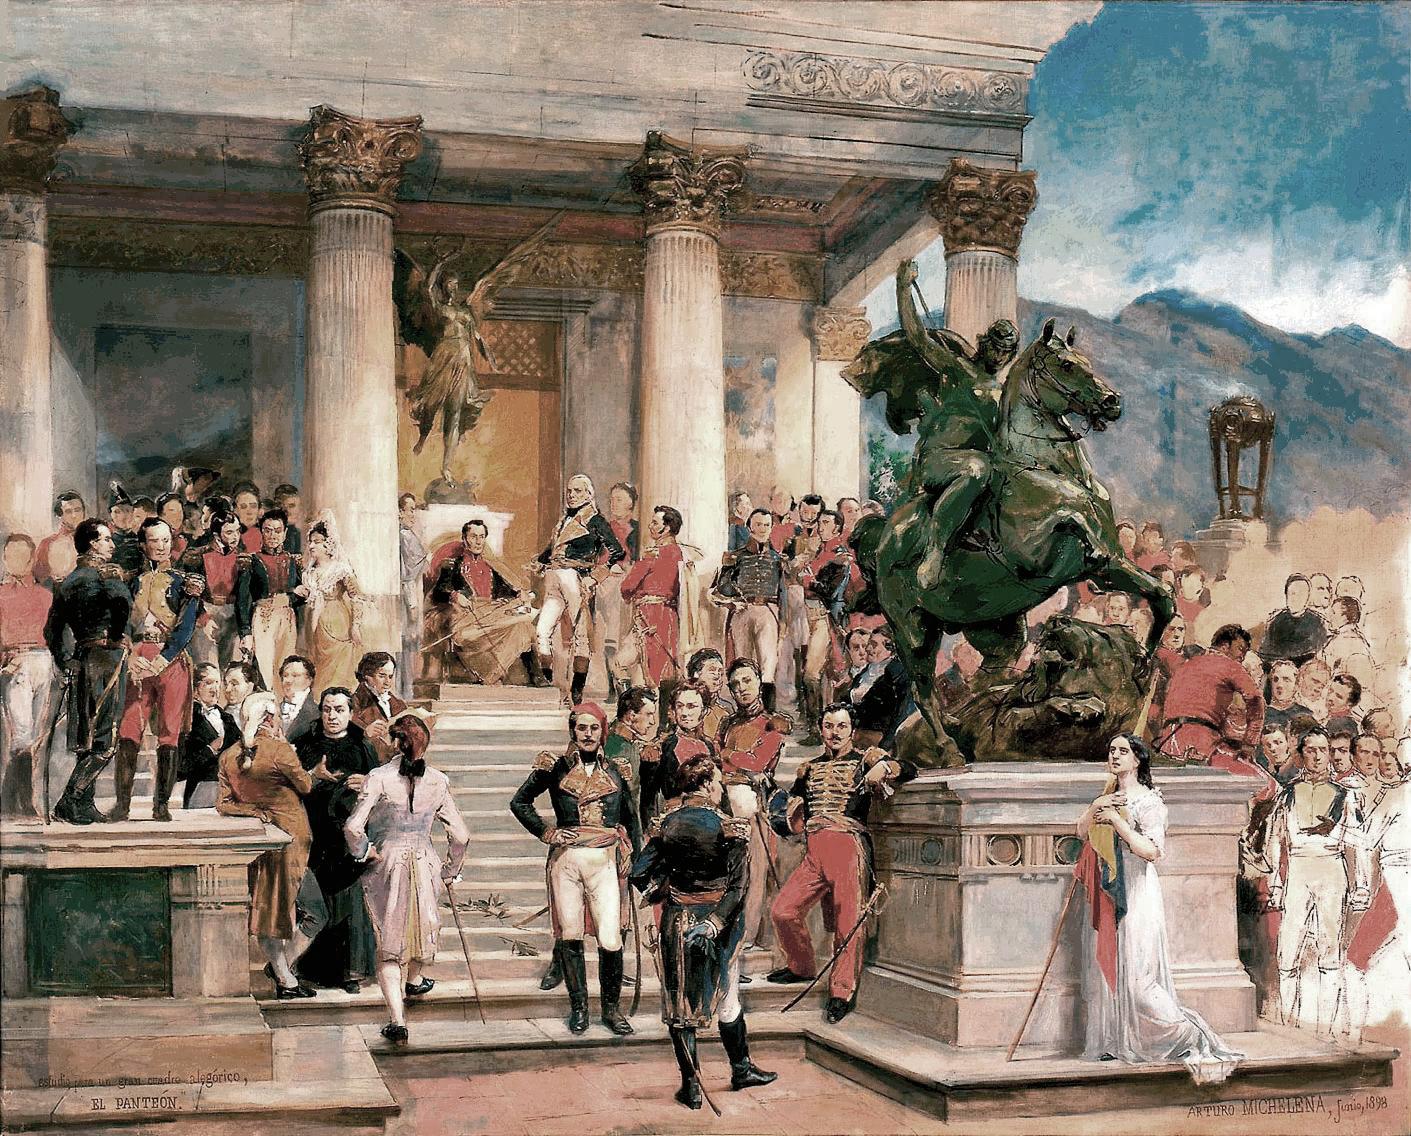 File:El Panteon de los Heroes.JPG - Wikimedia Commons